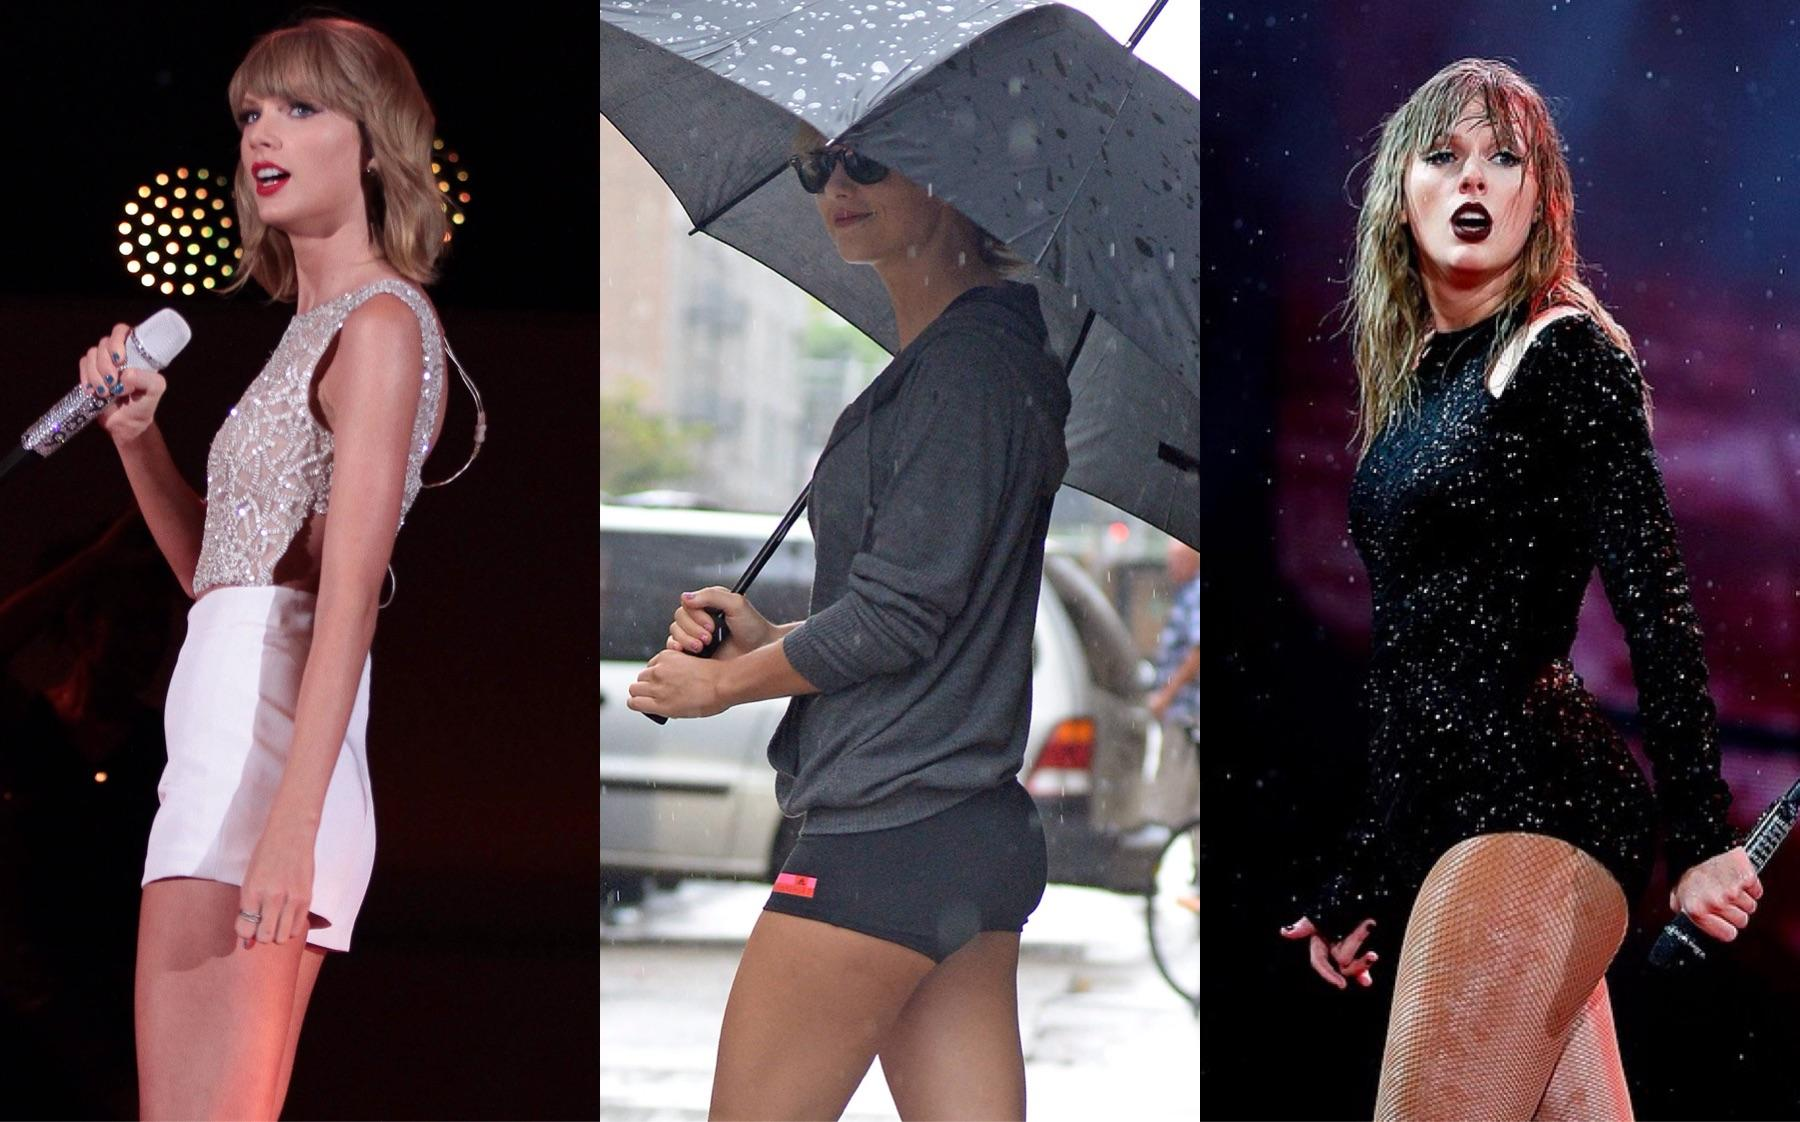 Taylor Swift's Evolution